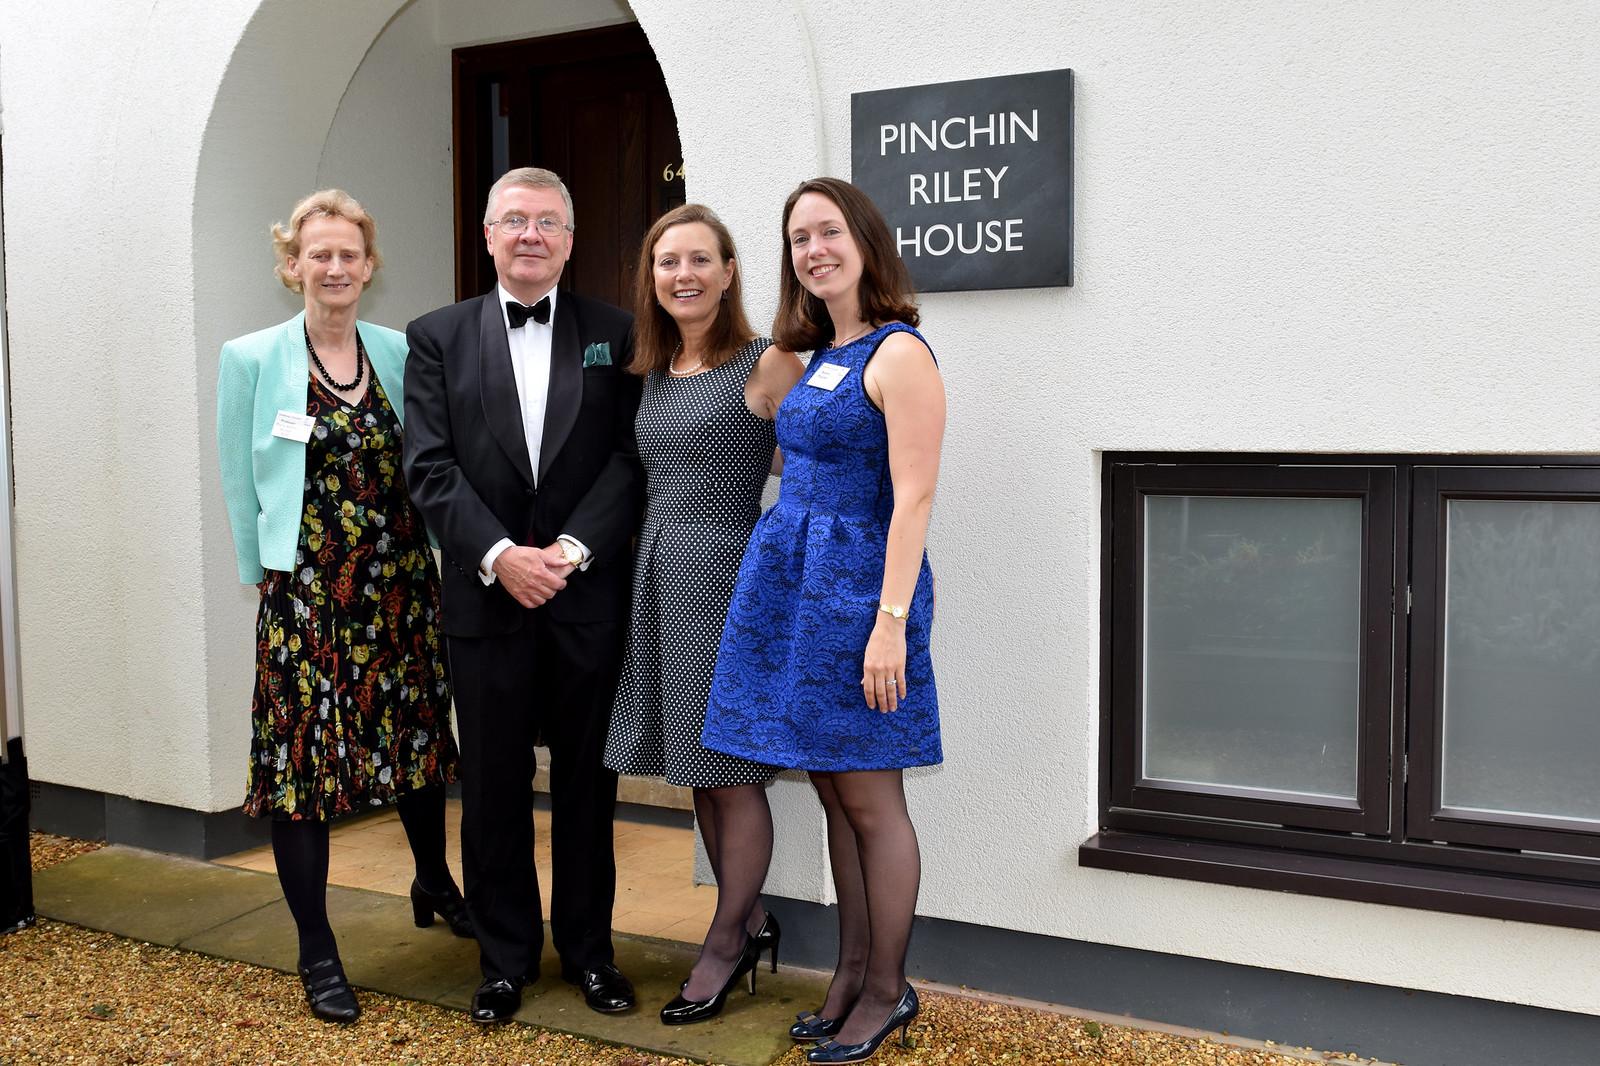 Pinchin Riley House naming